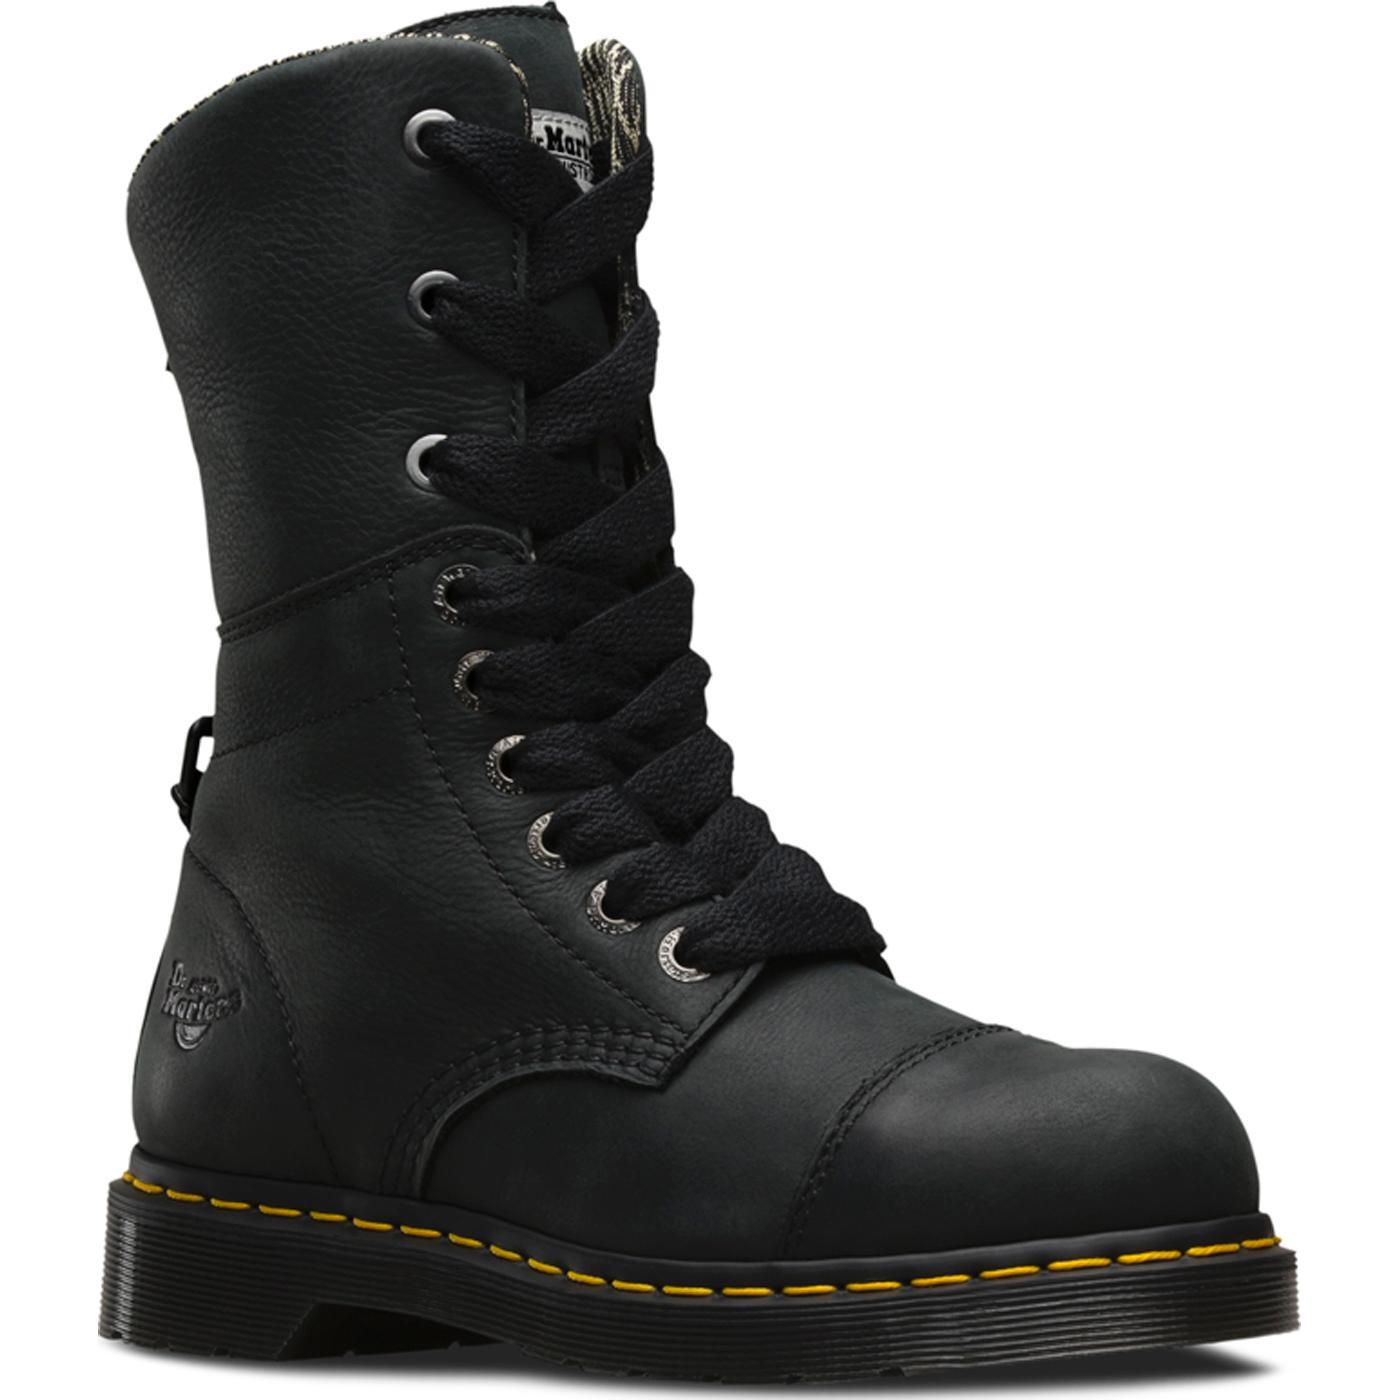 Dr. Martens Leah Women s Steel Toe Roll-down Work BootDr. Martens Leah Women s  Steel Toe Roll-down Work Boot a6dea775a5